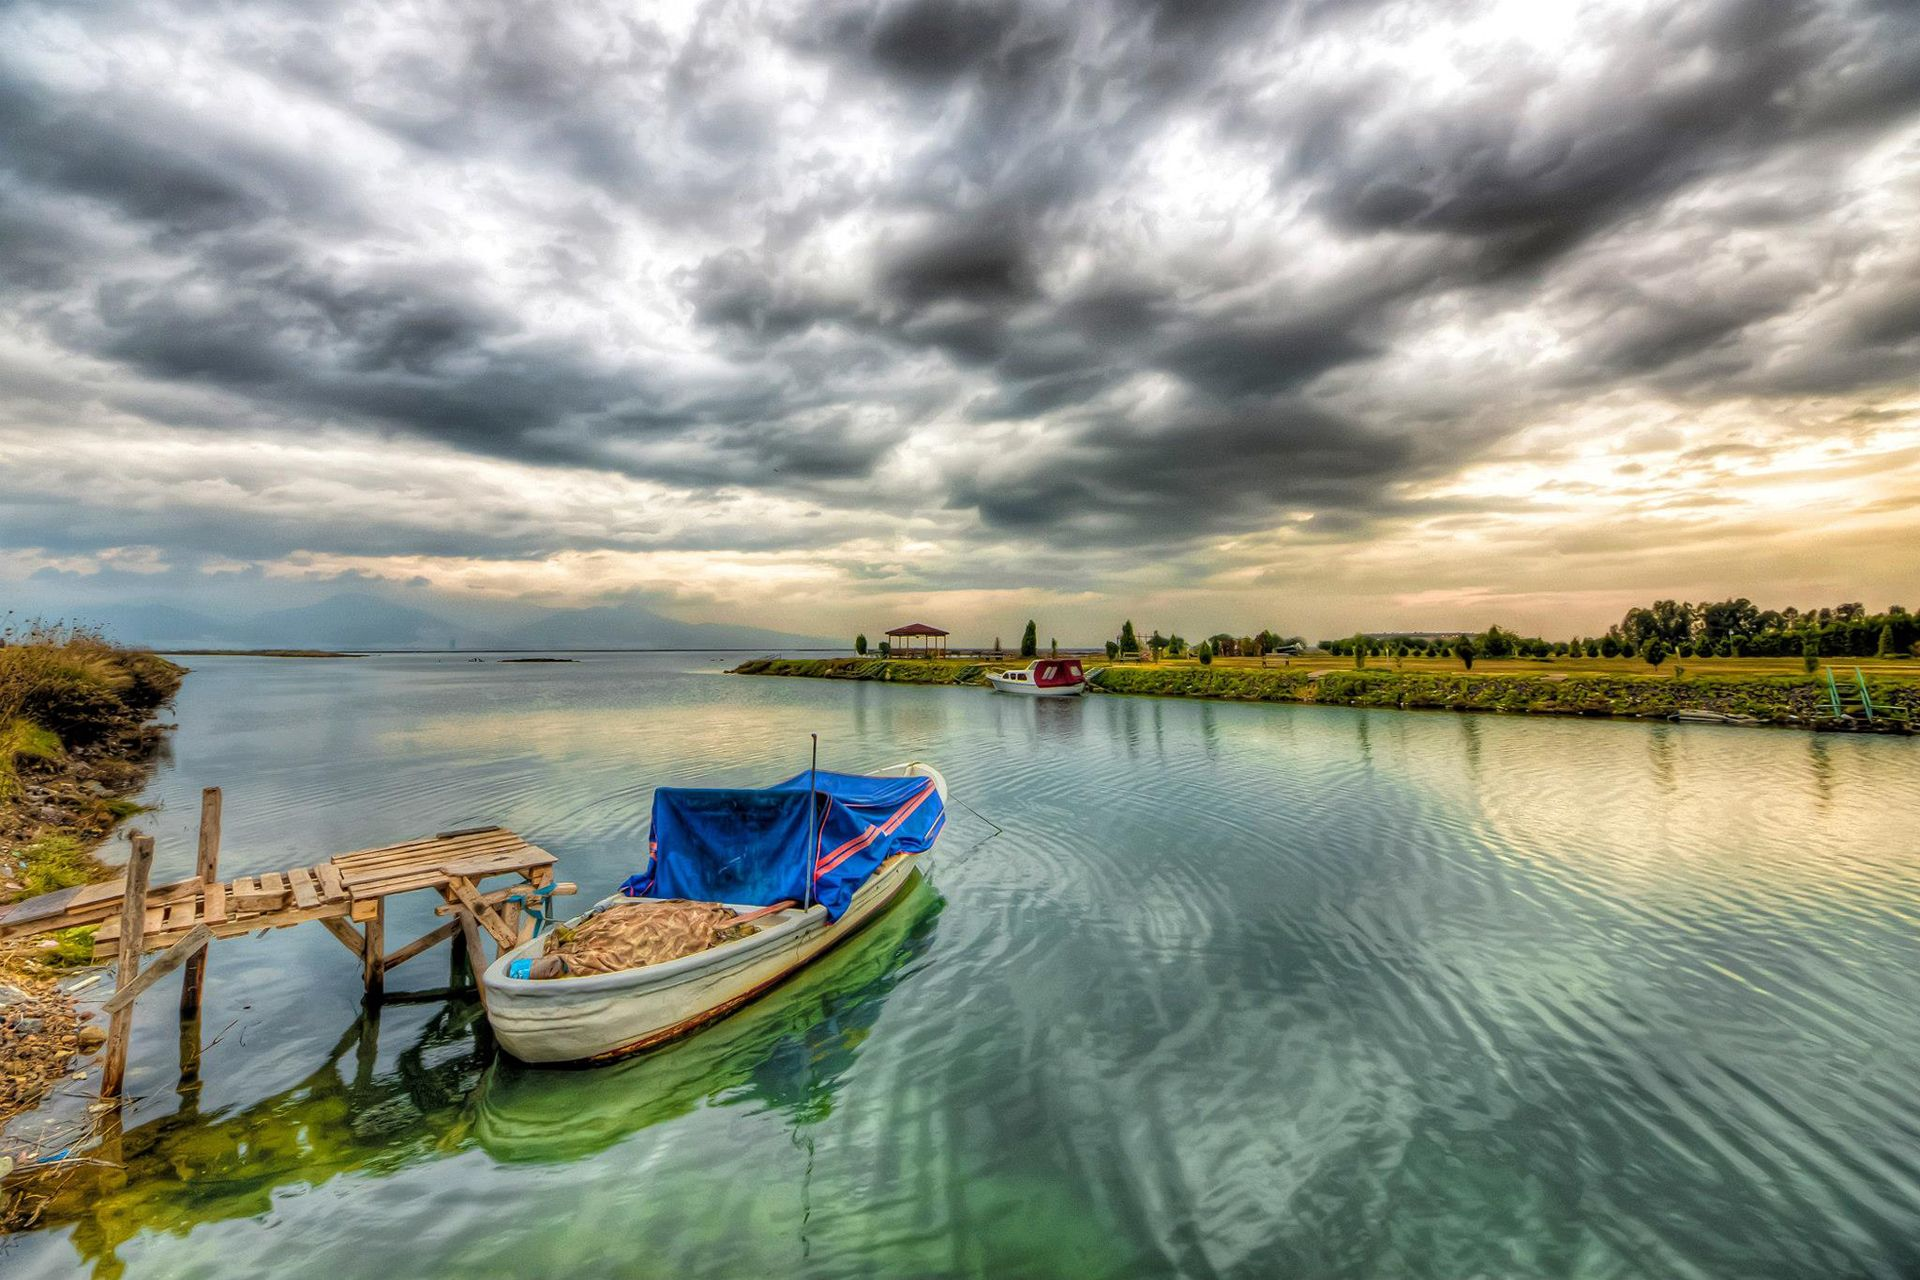 Ada Resim - Wallpaper - Güzel Resimler - Manzara Resimleri